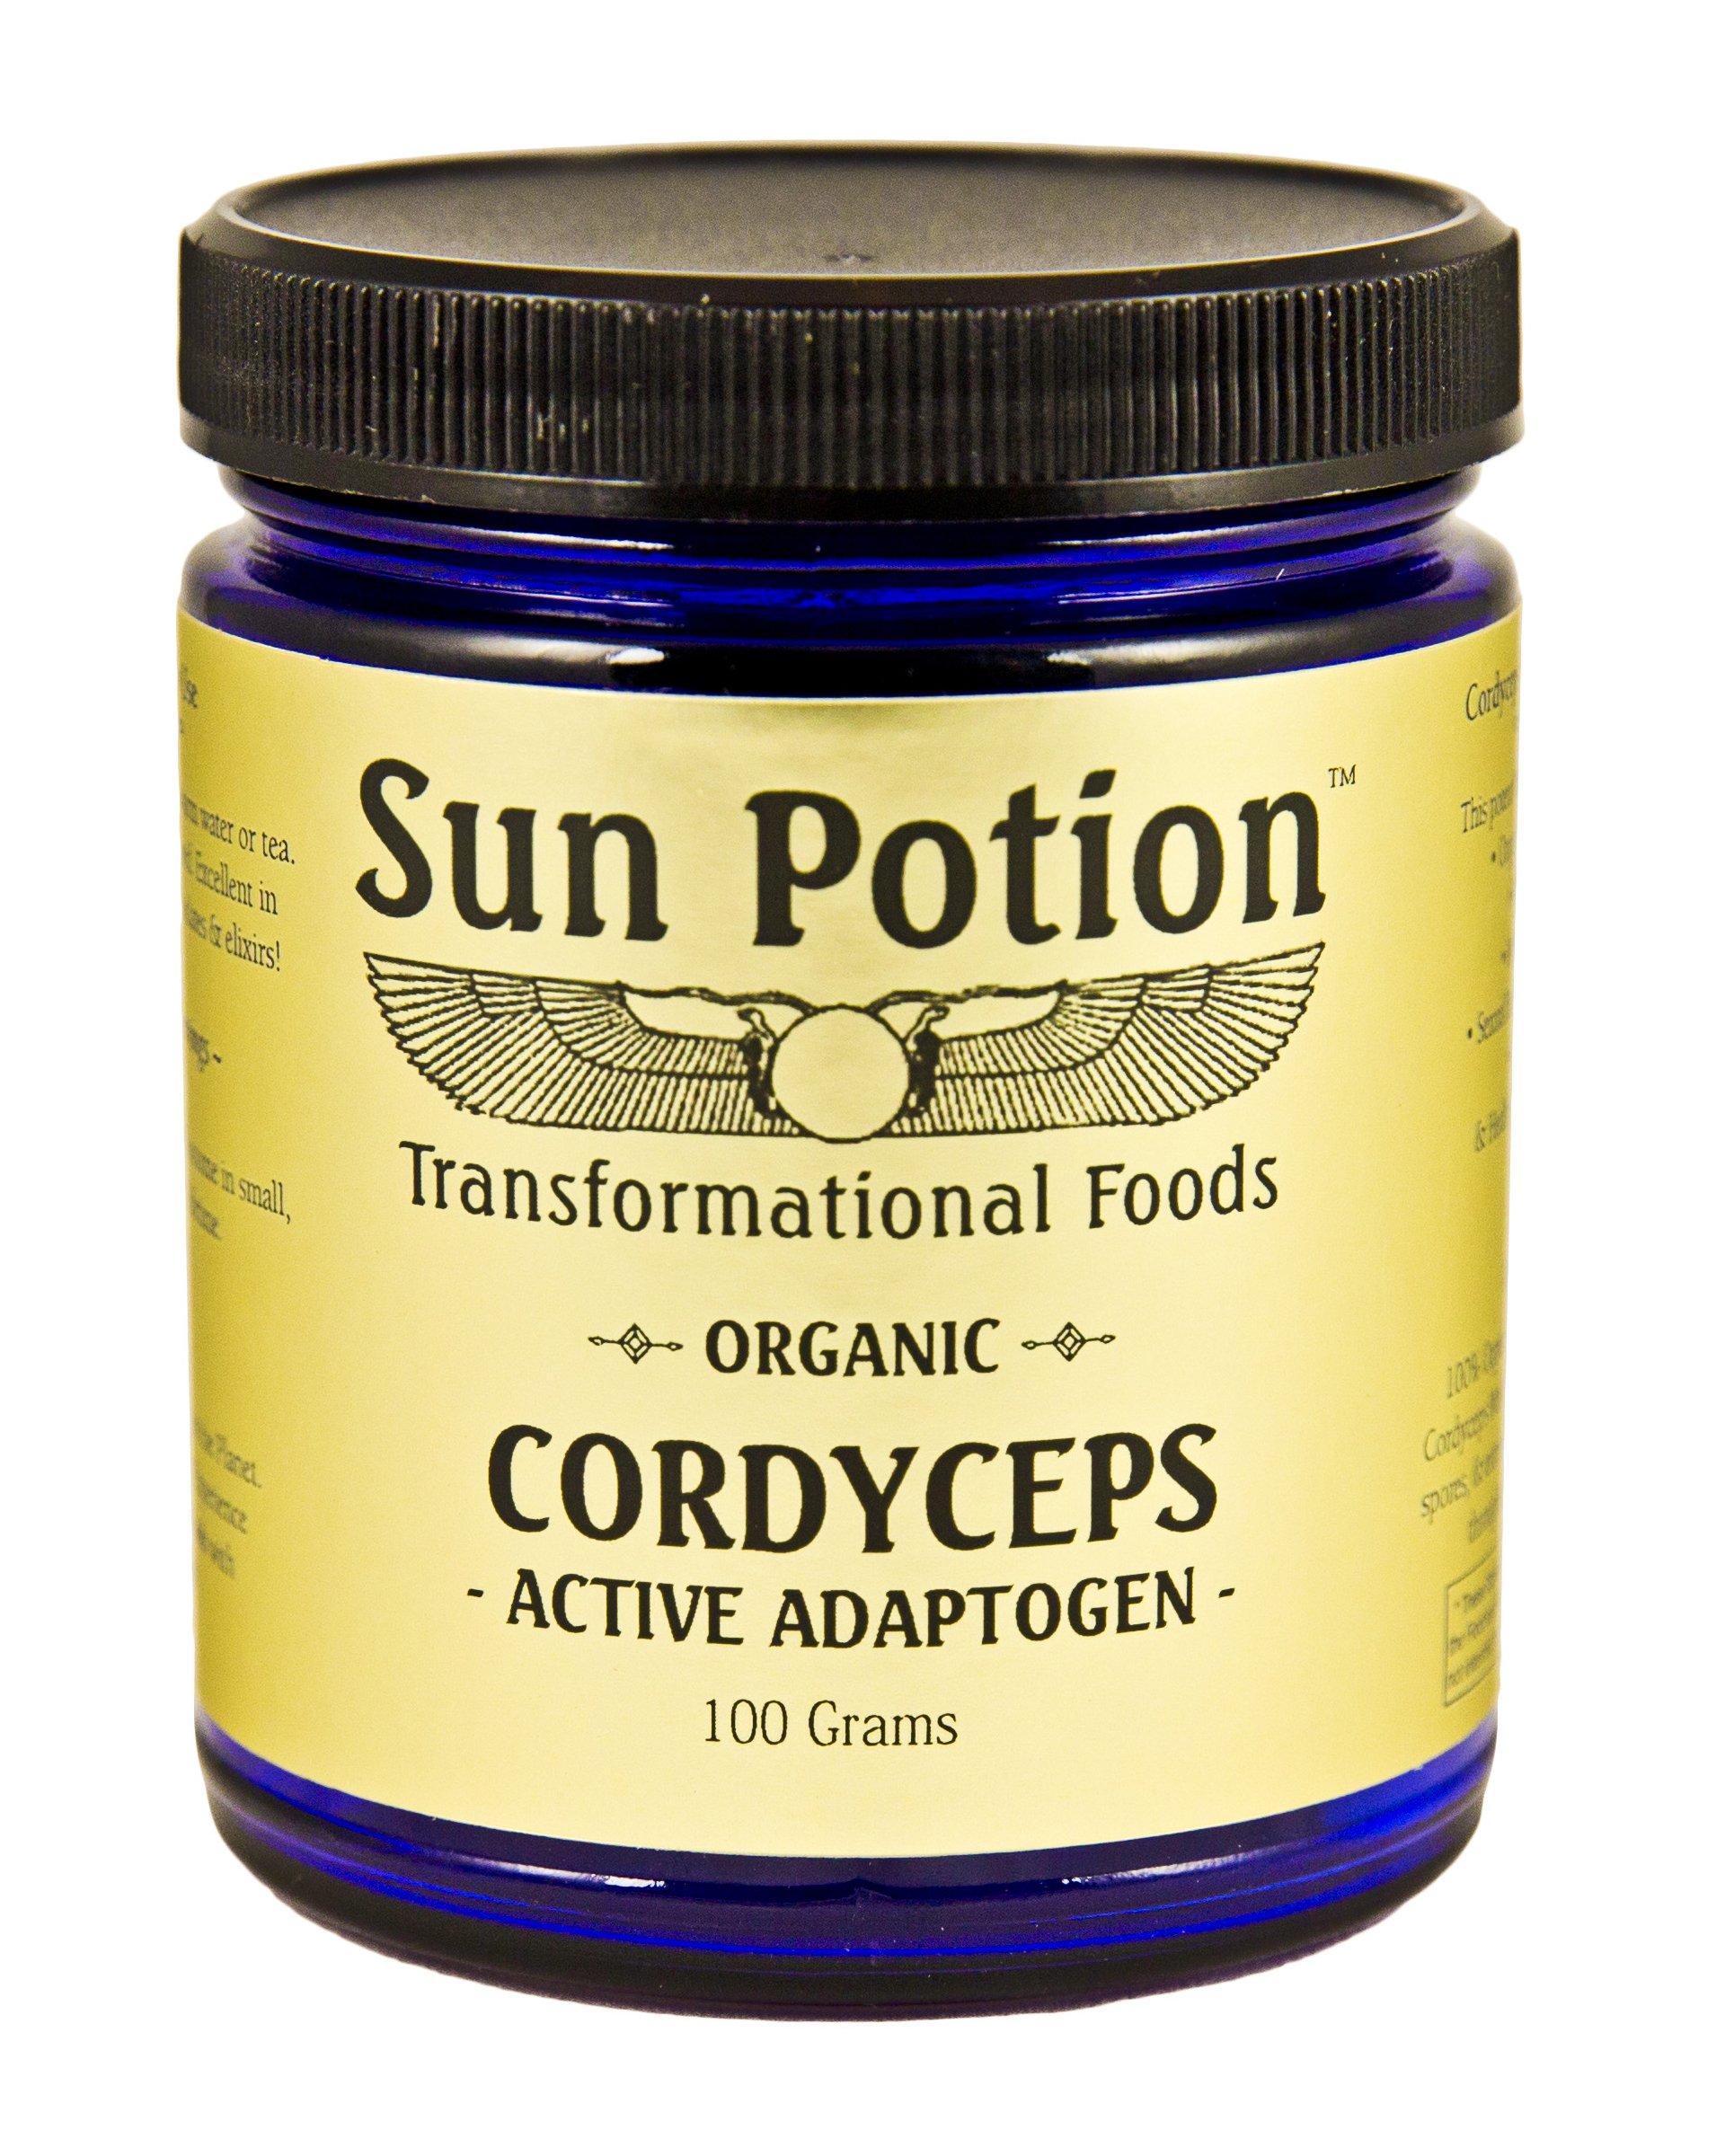 Sun Potion Organic Cordyceps Mushroom Powder - 100 Gram Jar